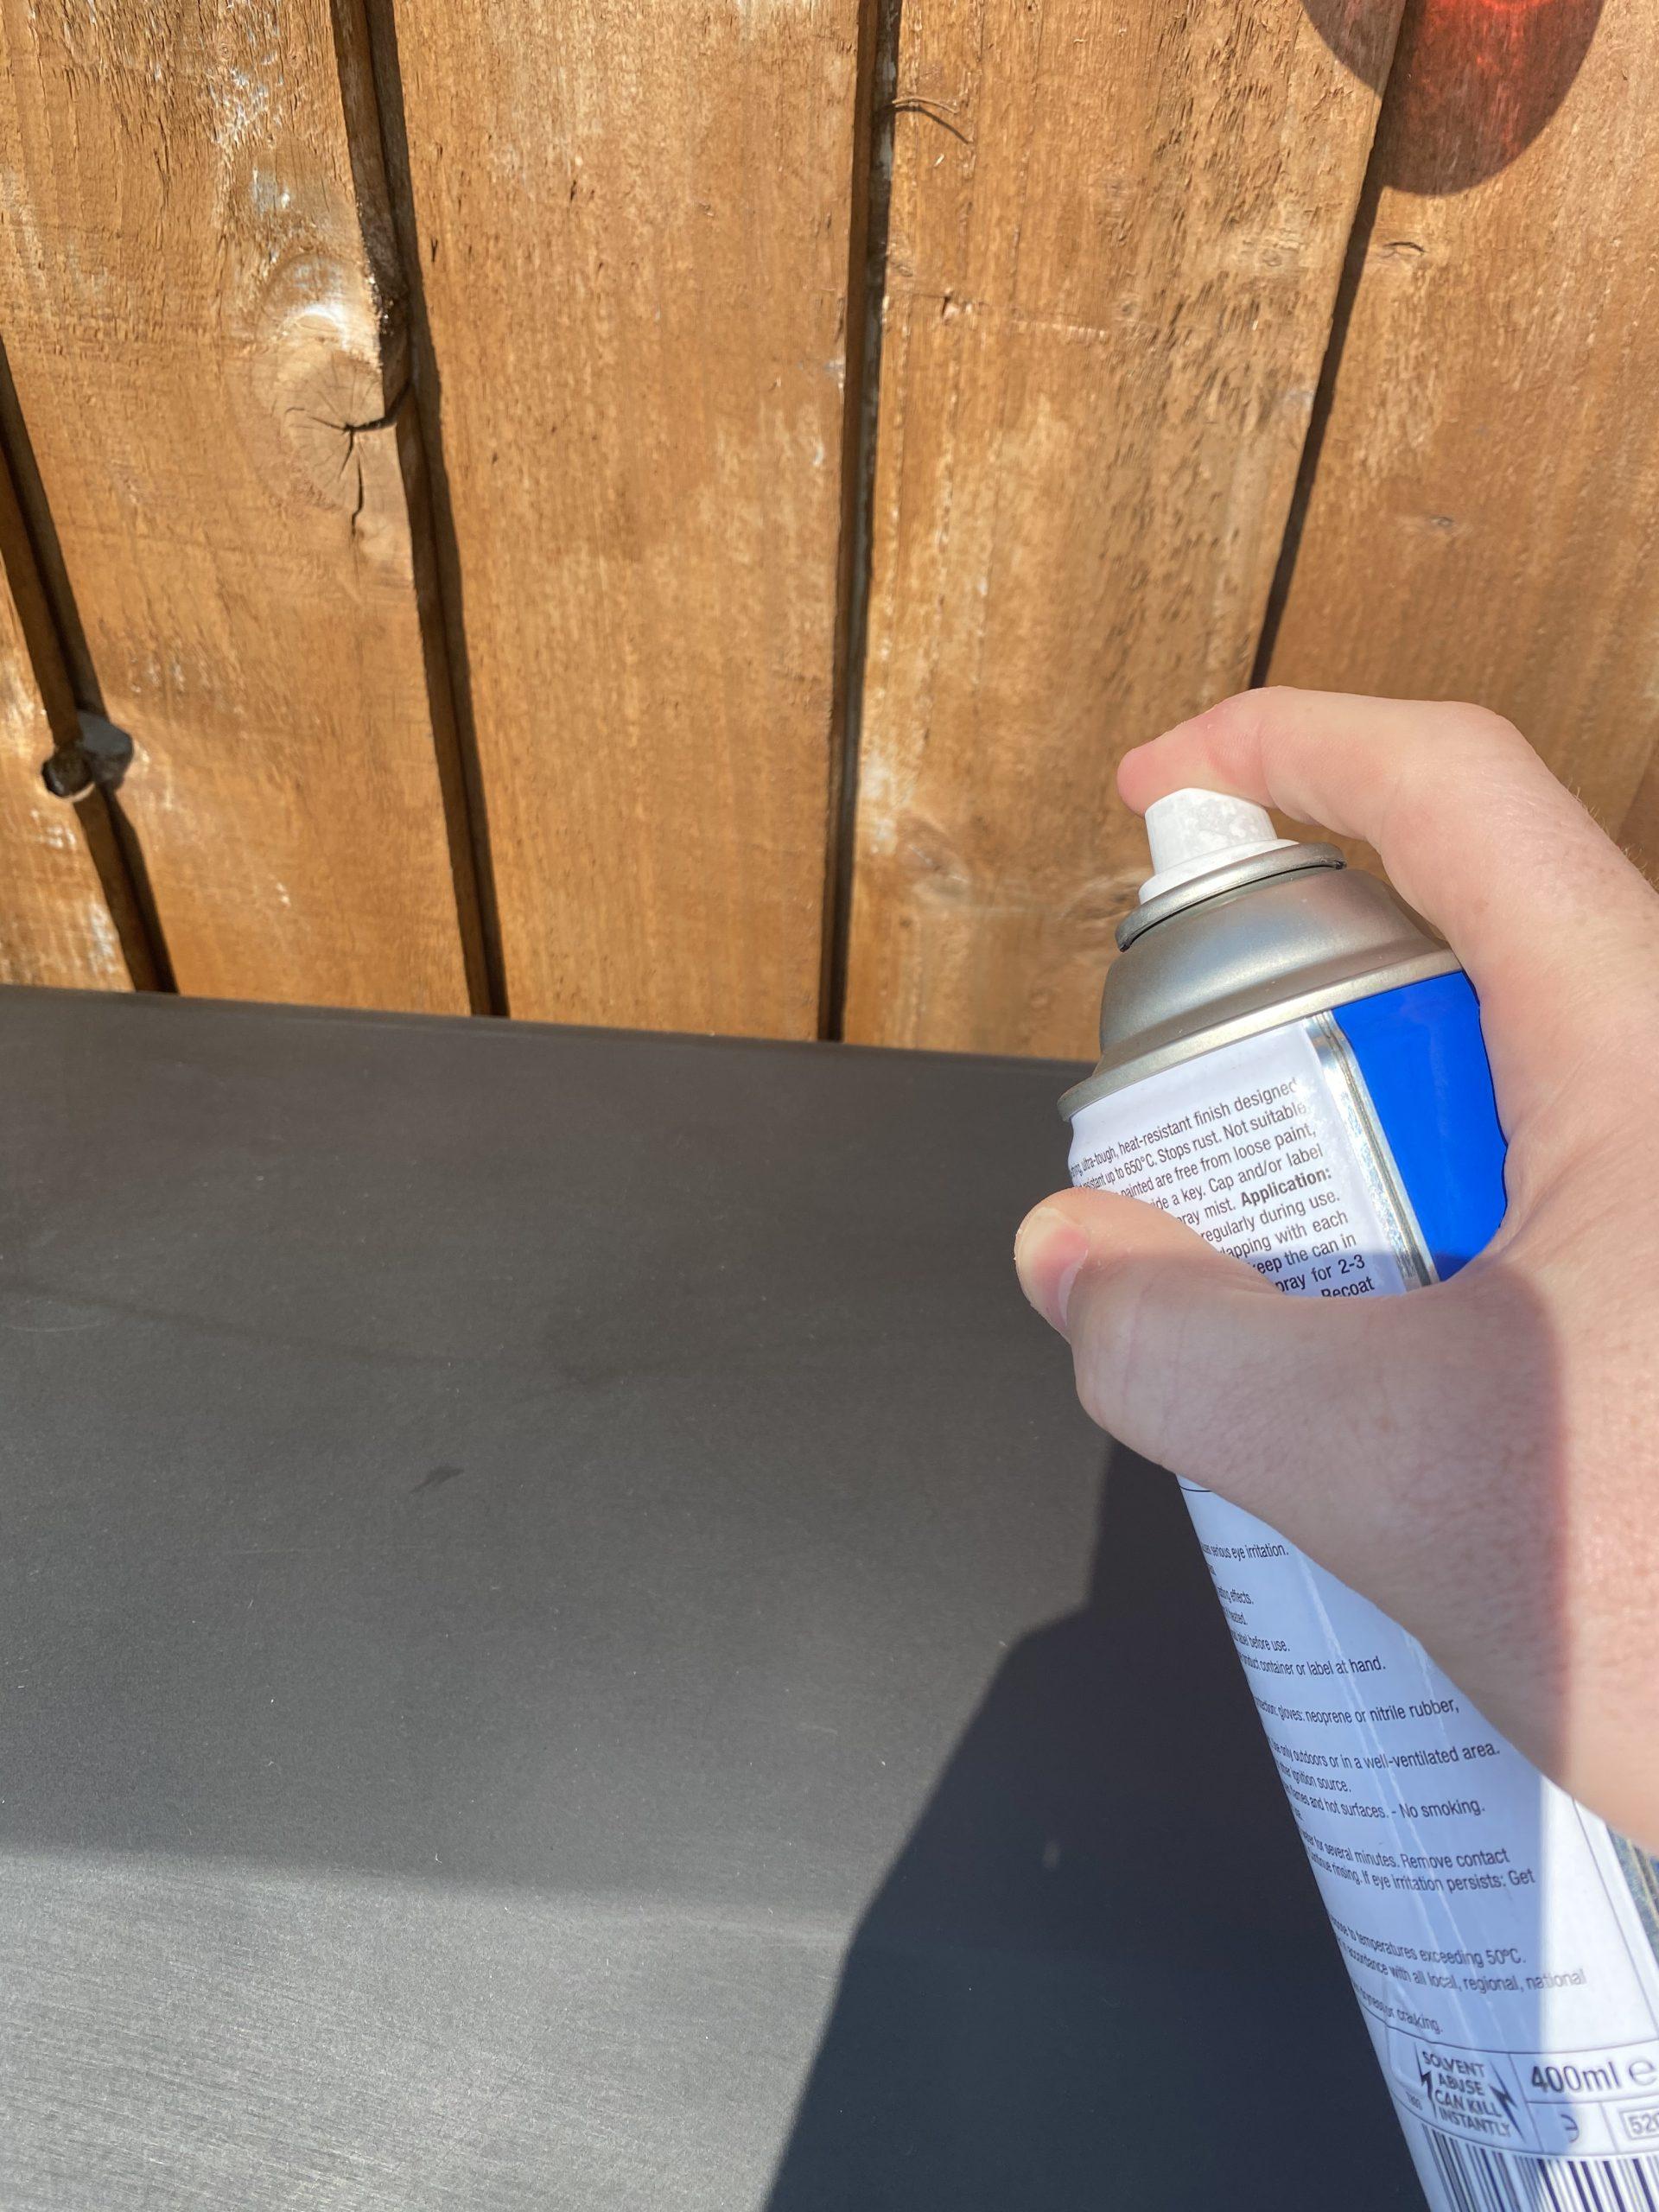 spray the gas BBQ